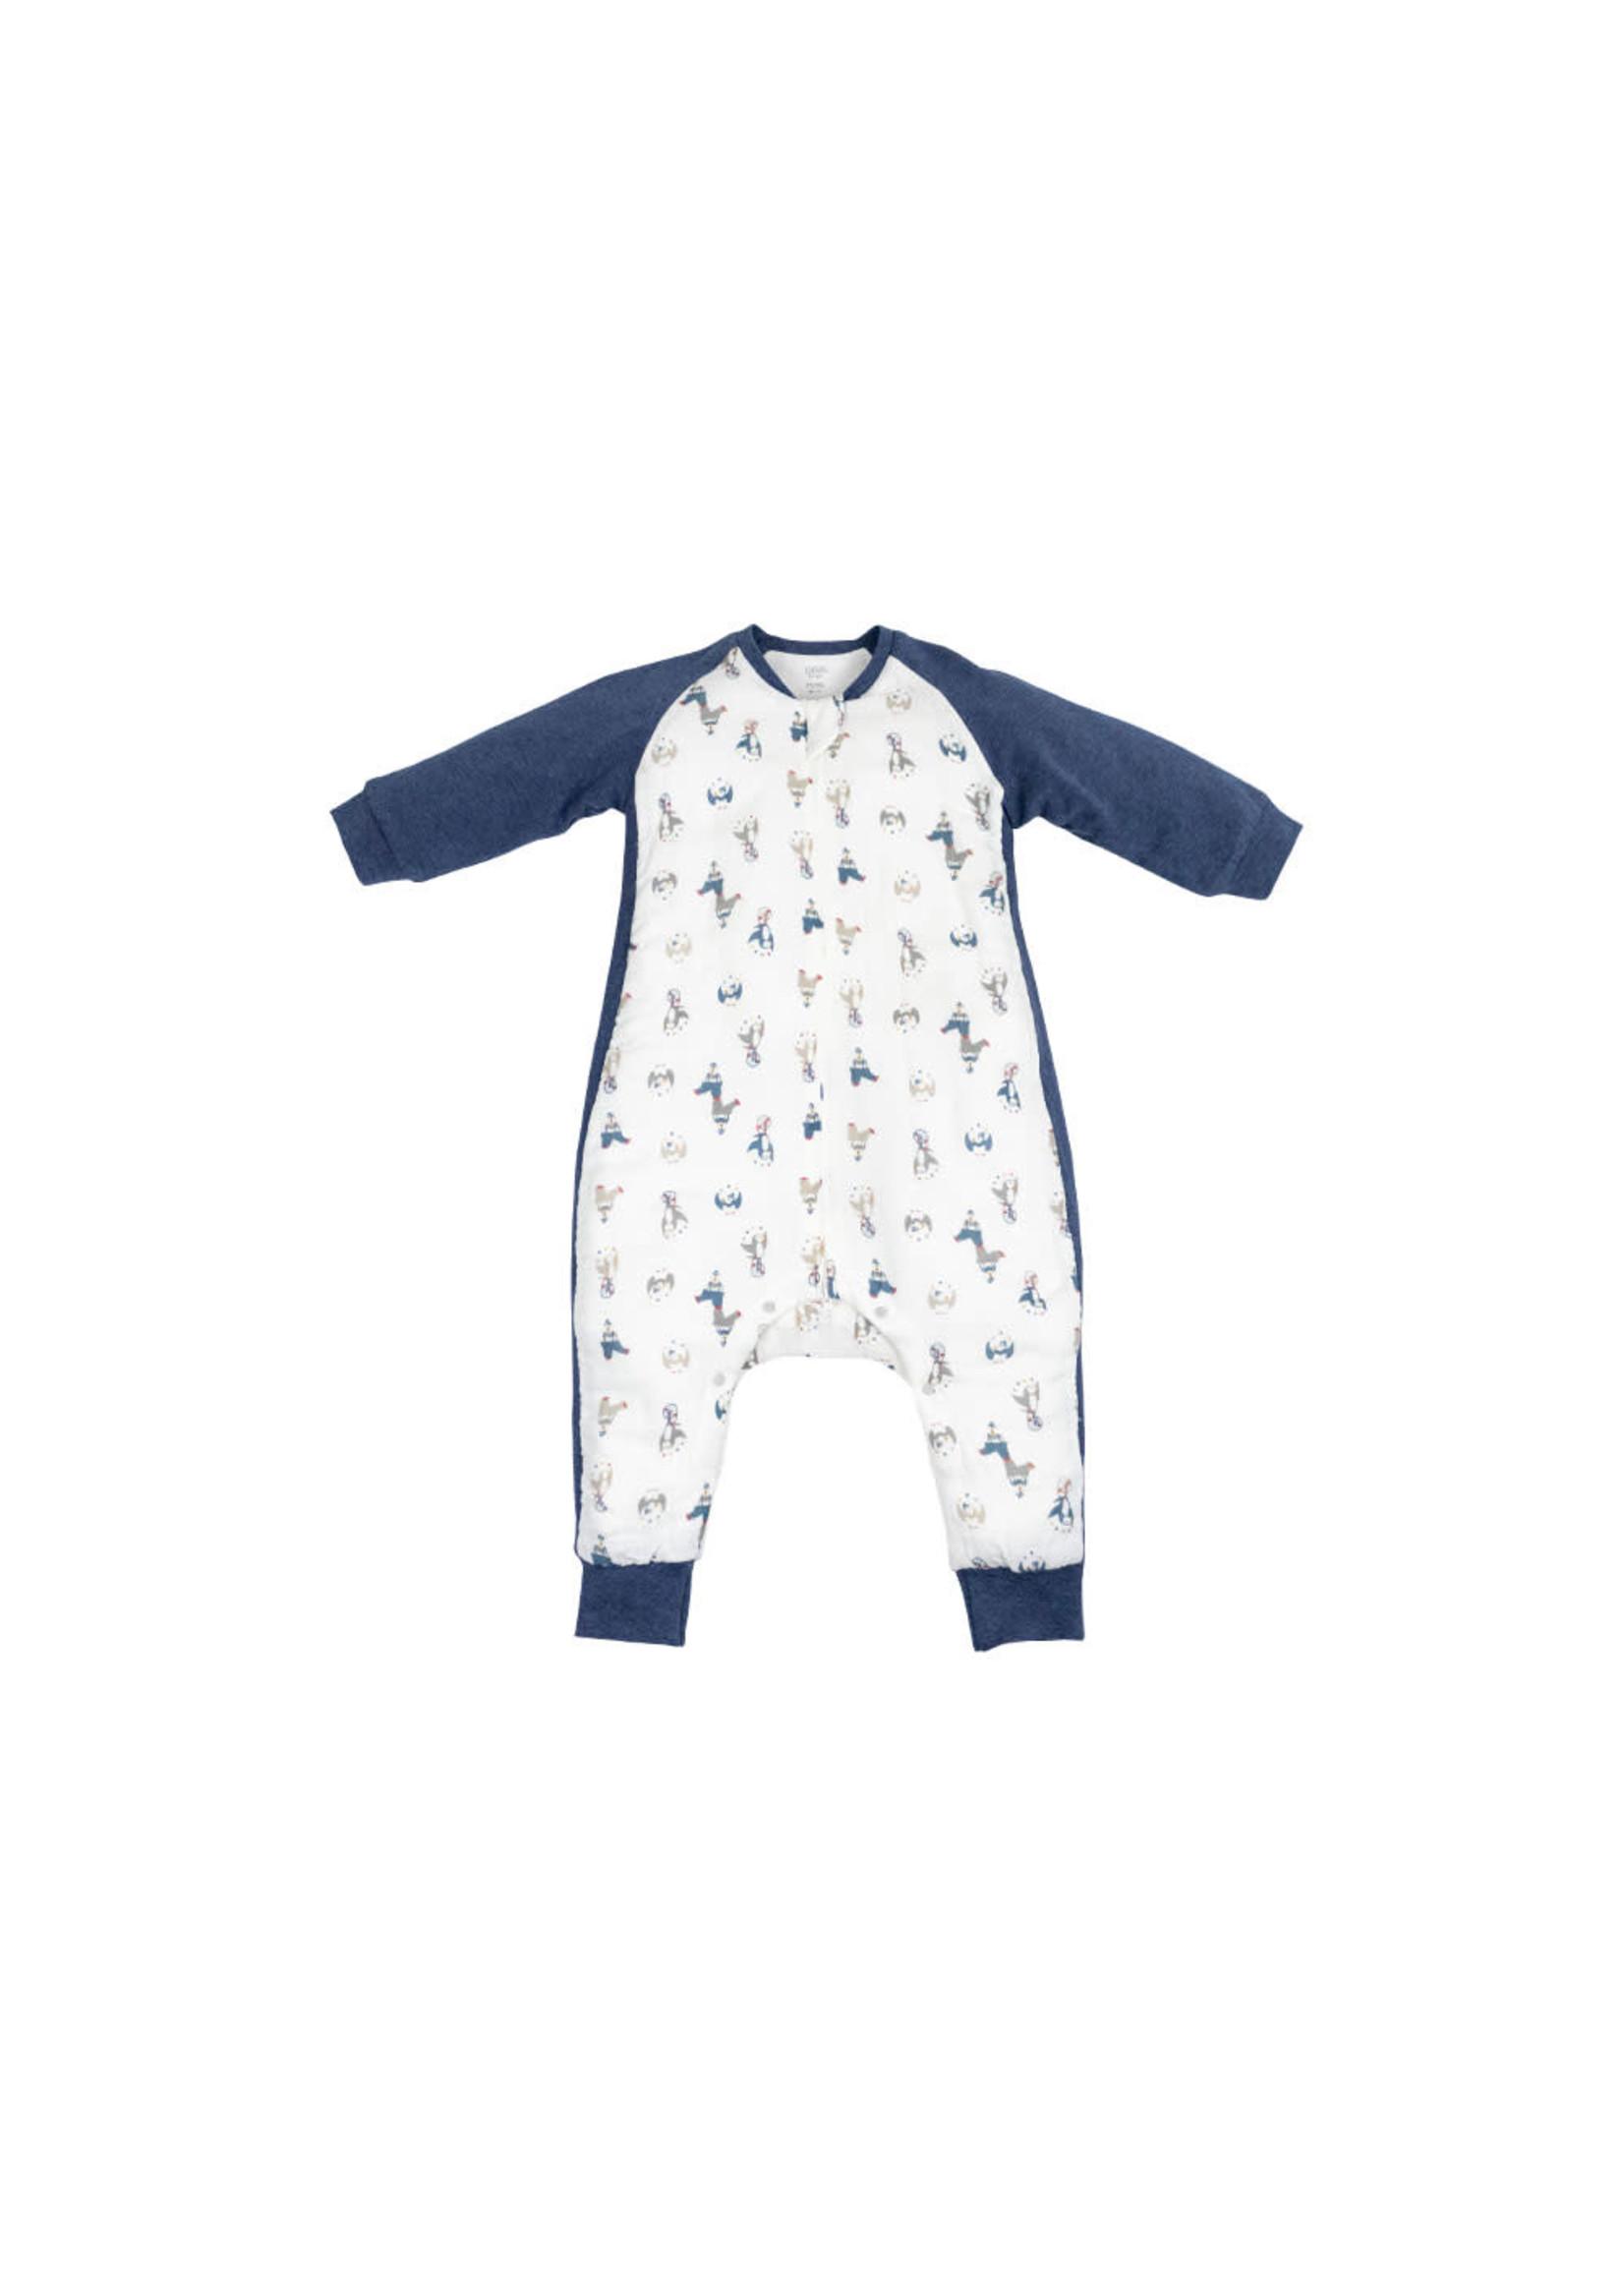 Nest Design ND 2.5 Sleep Suit (Circus Puffin - Longsleeve)